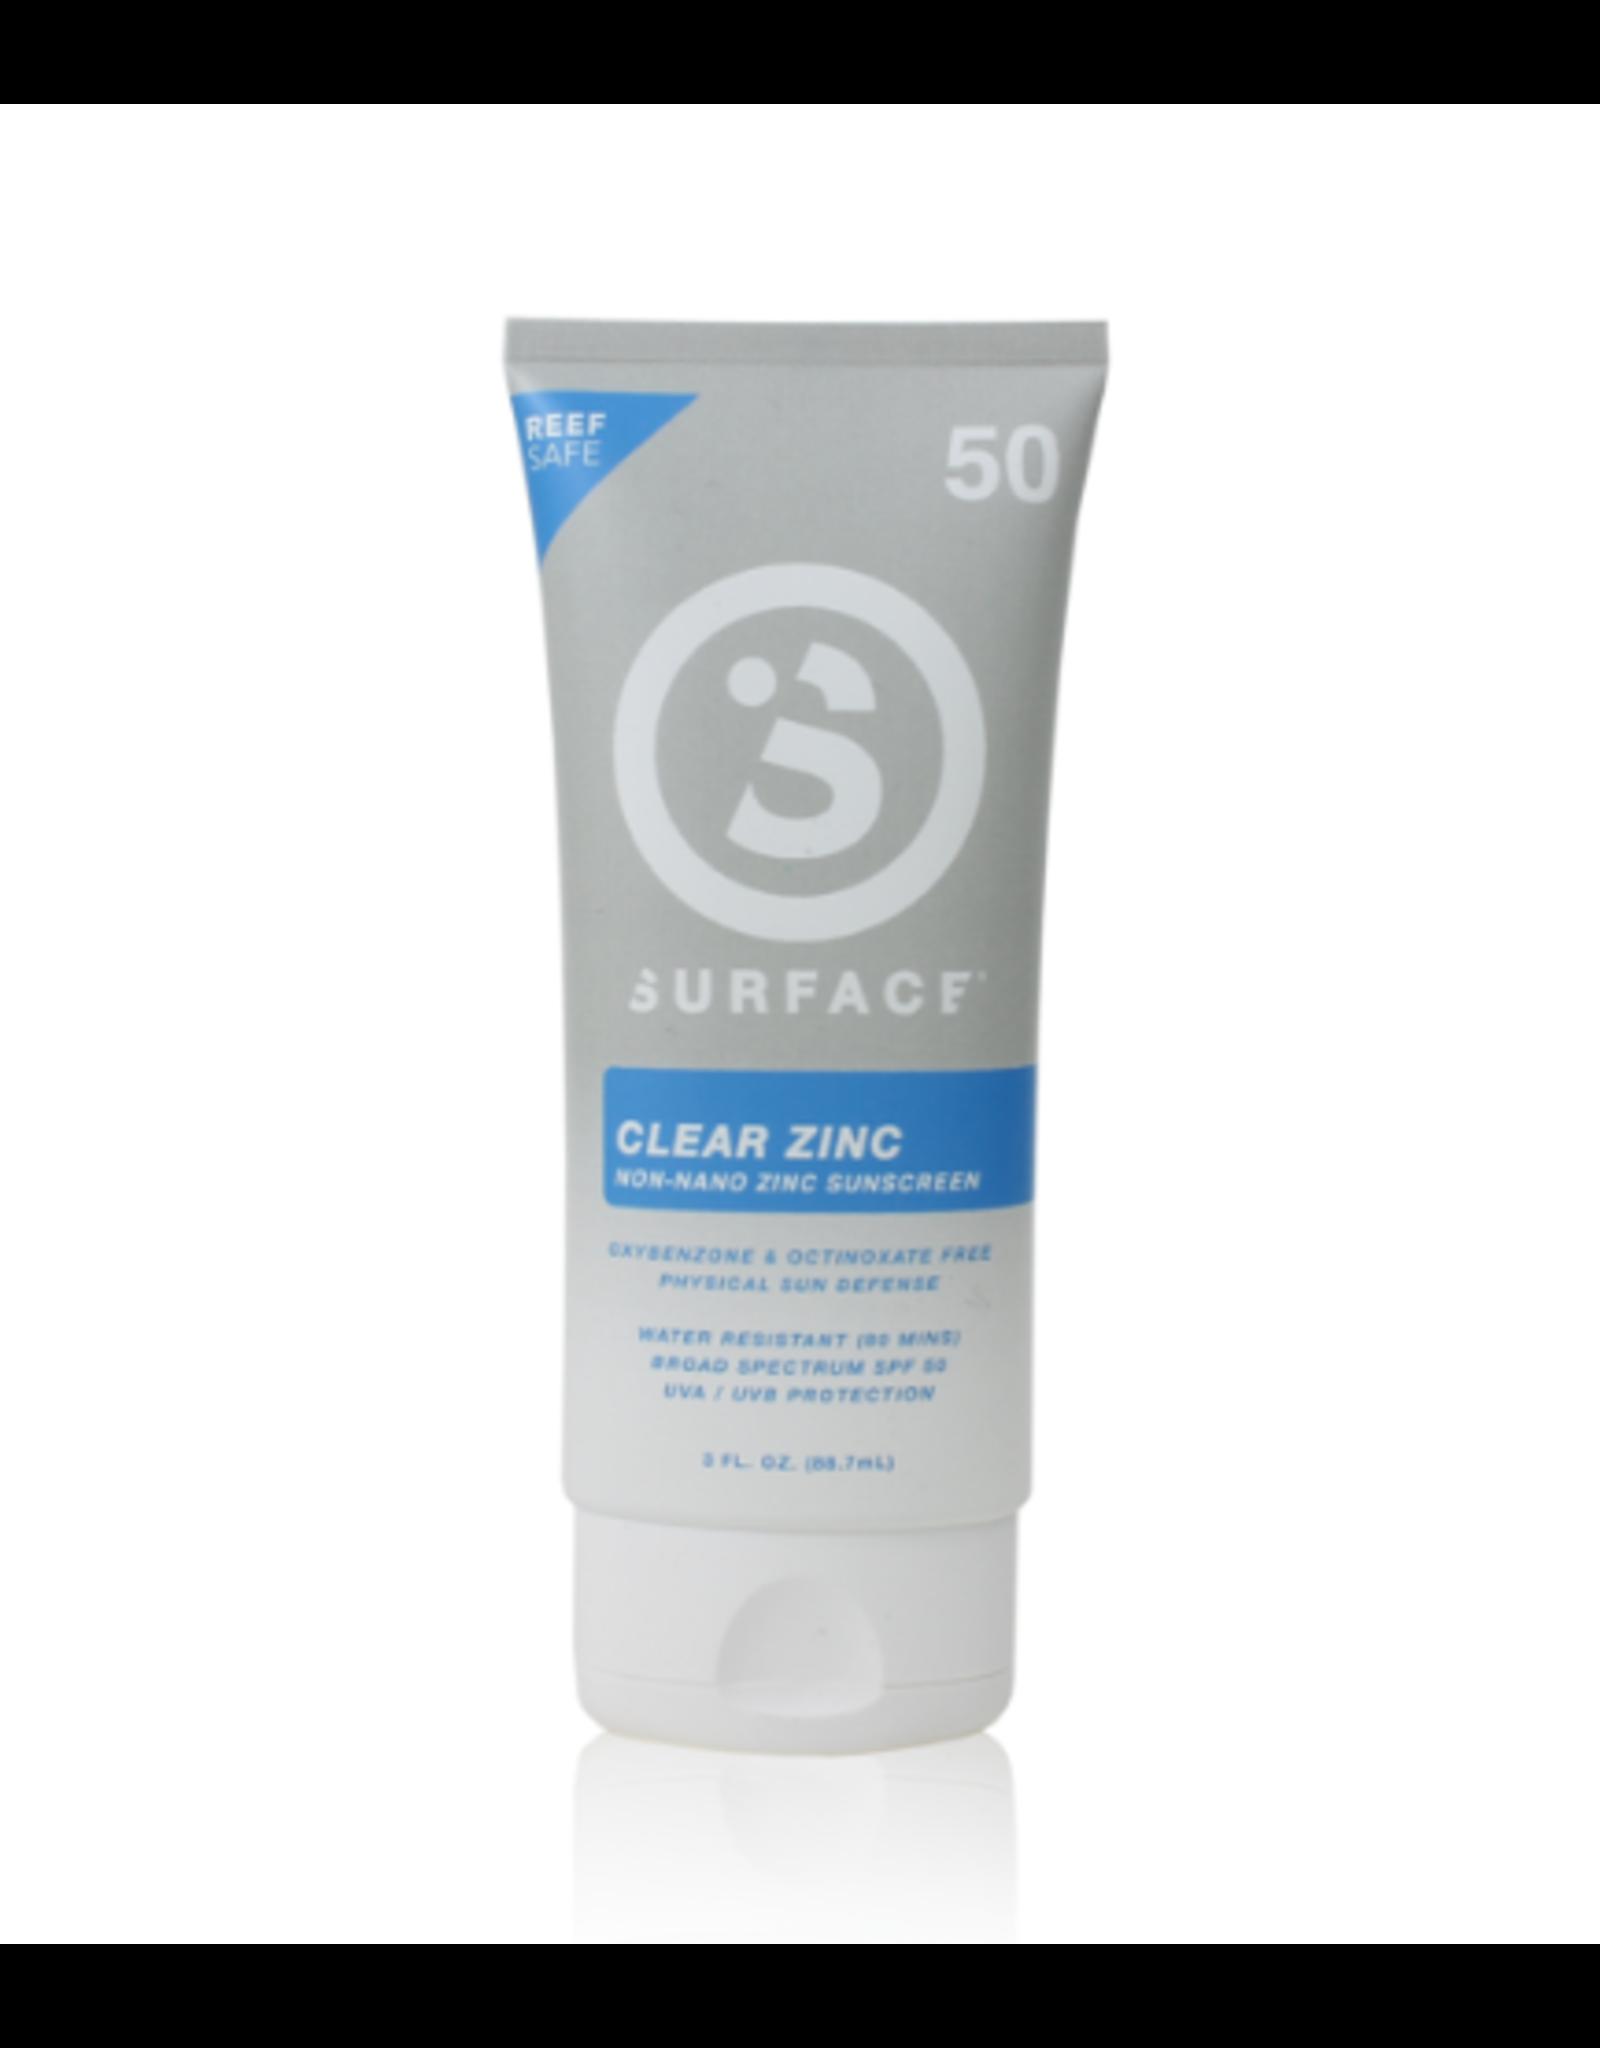 Surface Surface SPF50 Clear Zinc Sunscreen Lotion 3oz